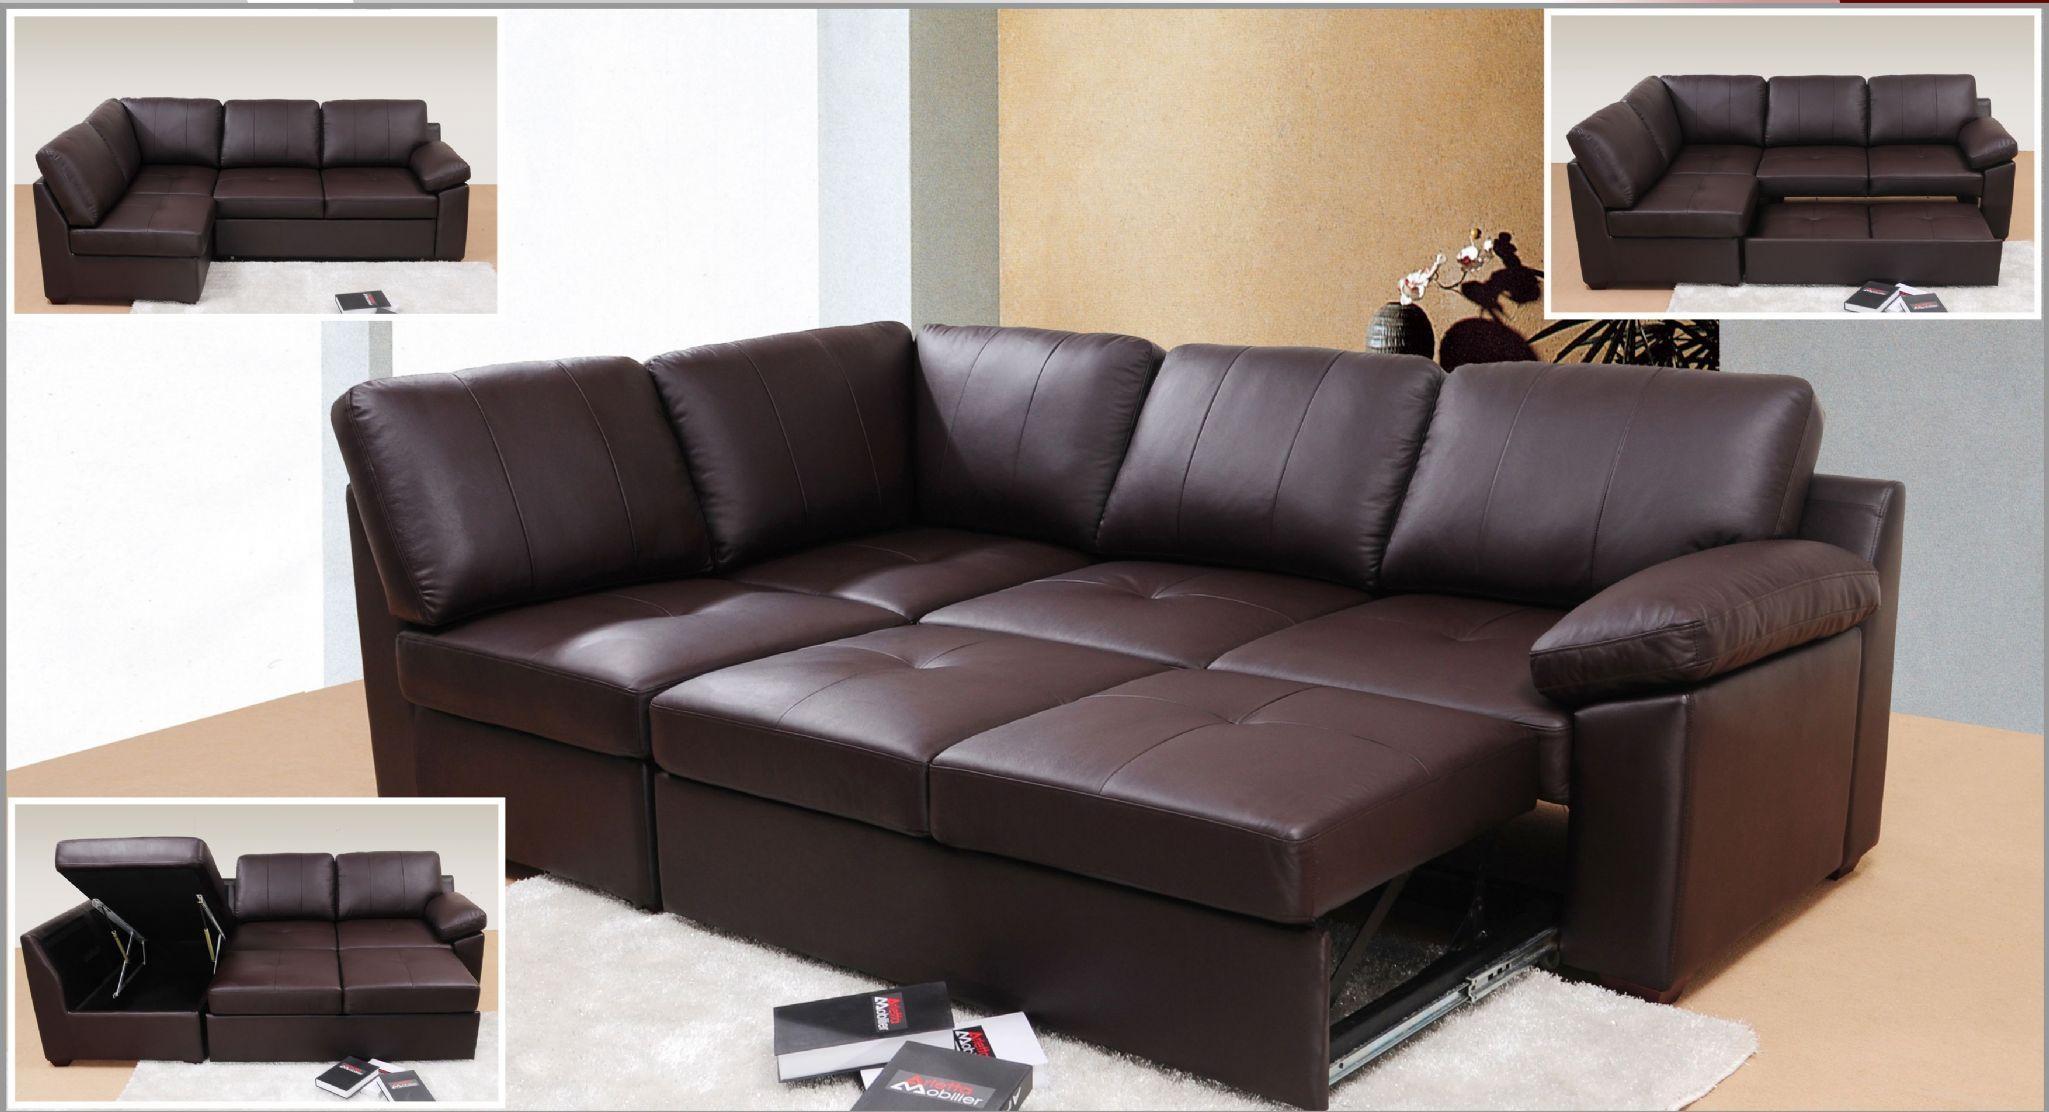 Sit And Sleep Comfortable On Elegant Corner Sofa Beds – Designinyou Within Corner Sofa Beds (View 3 of 20)